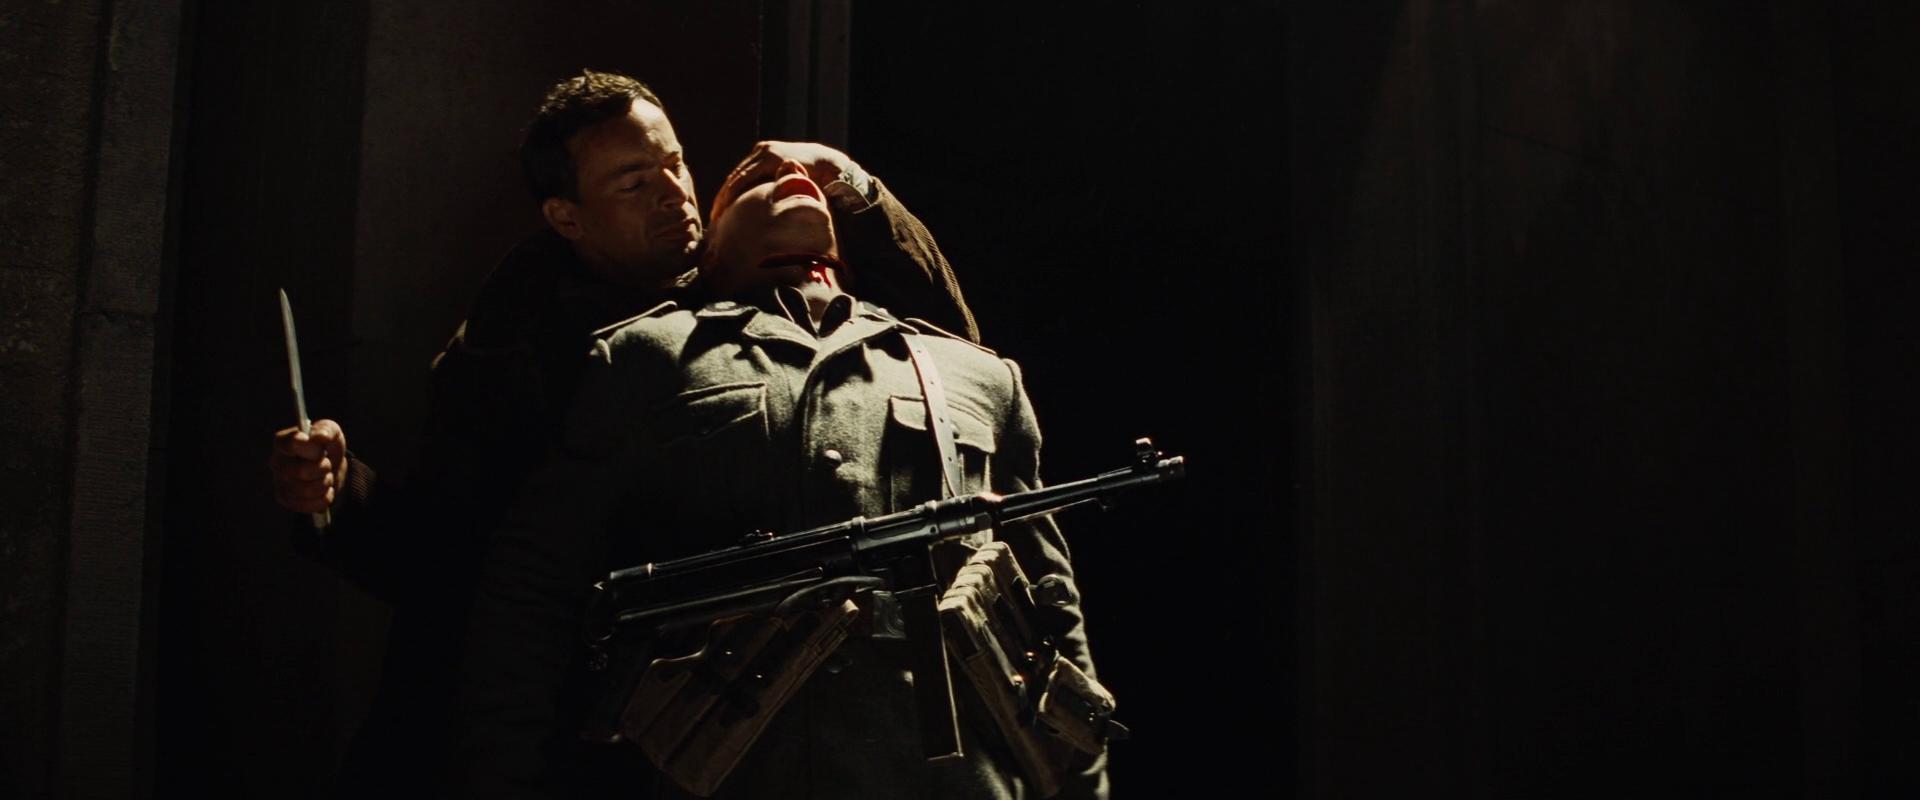 Russian Soldier Throat Cut